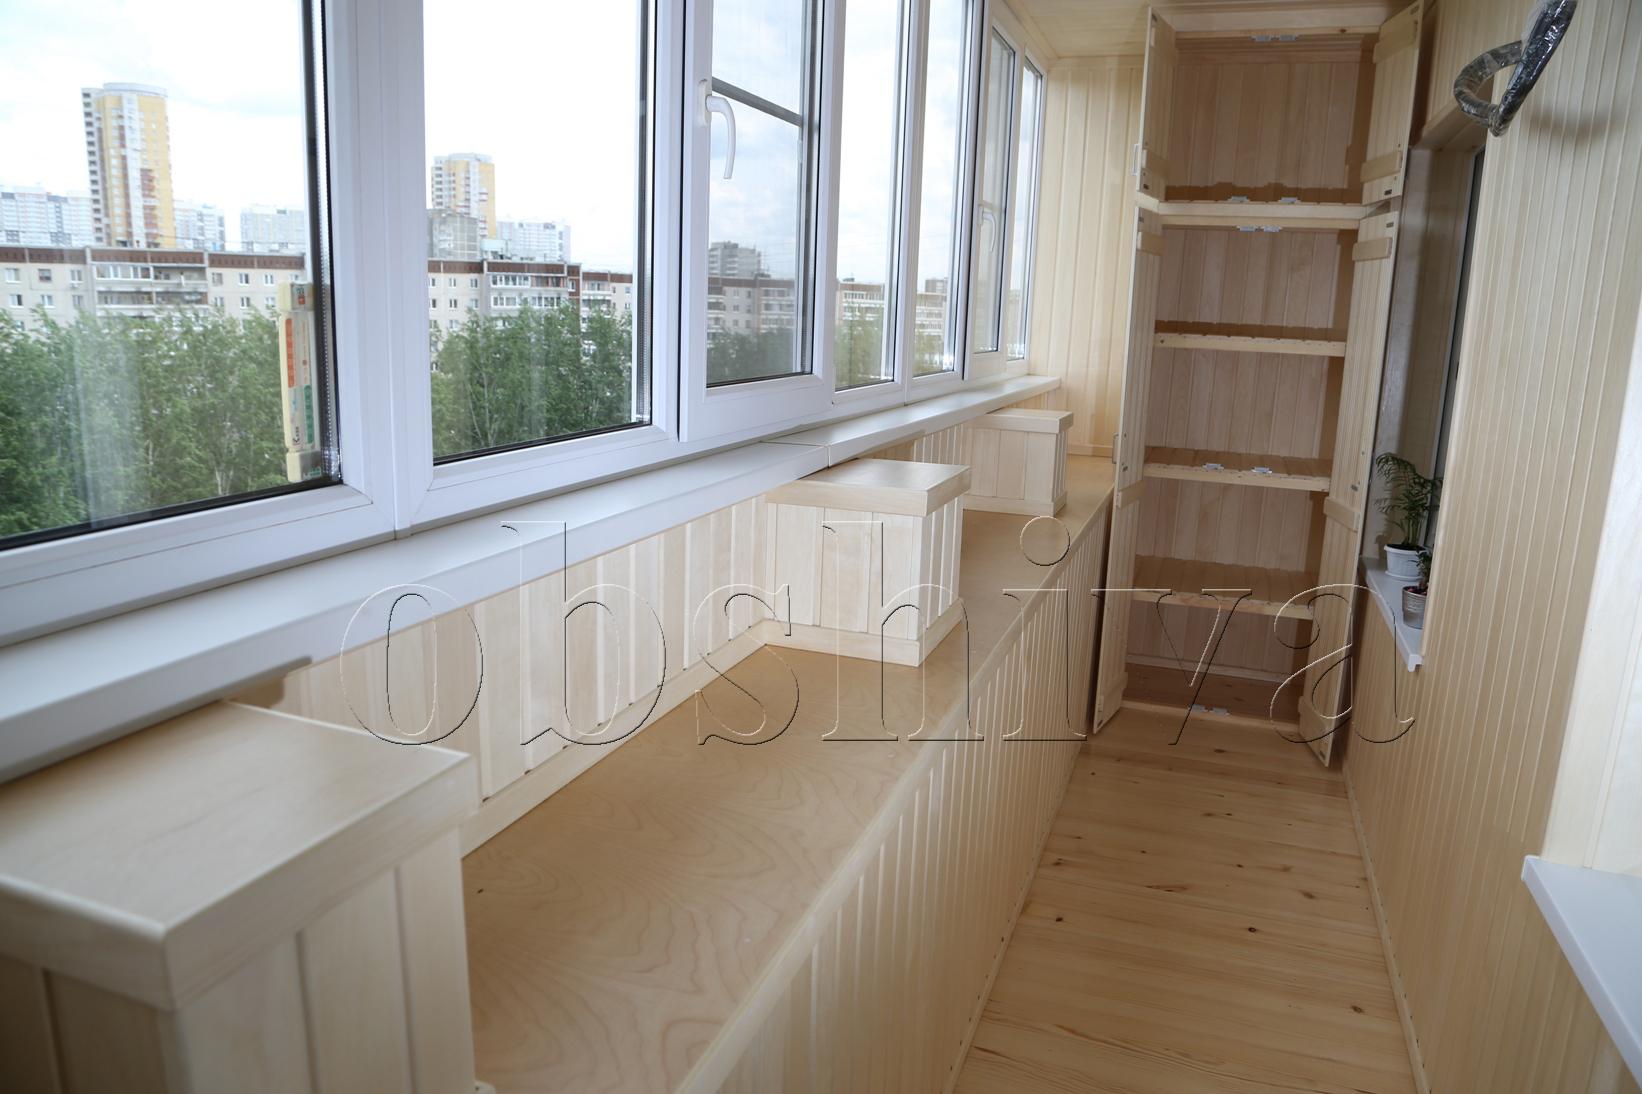 Ремонт на балкон своими руками фото